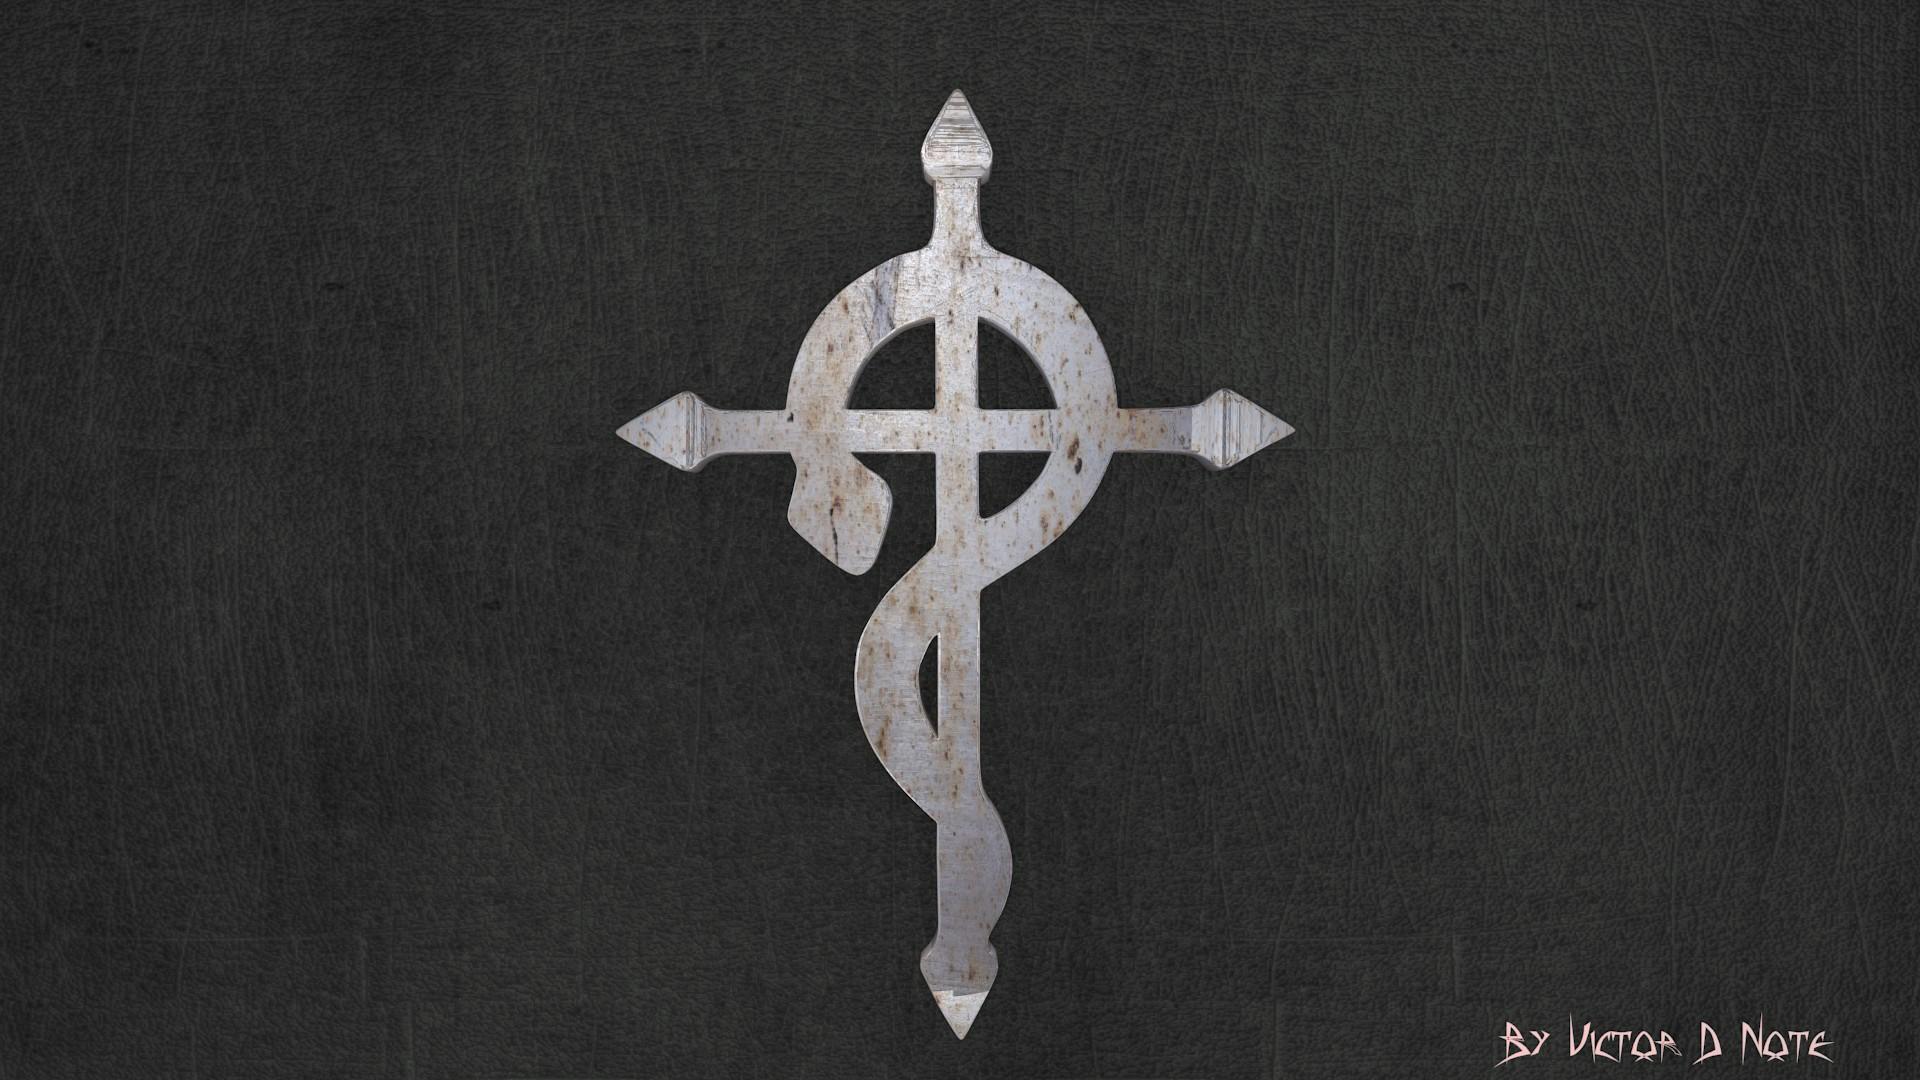 Top Wallpaper Logo Fullmetal Alchemist - fullmetal_alchemist_logo_by_vihkun-d4mk3x4  Pic_955617.jpg